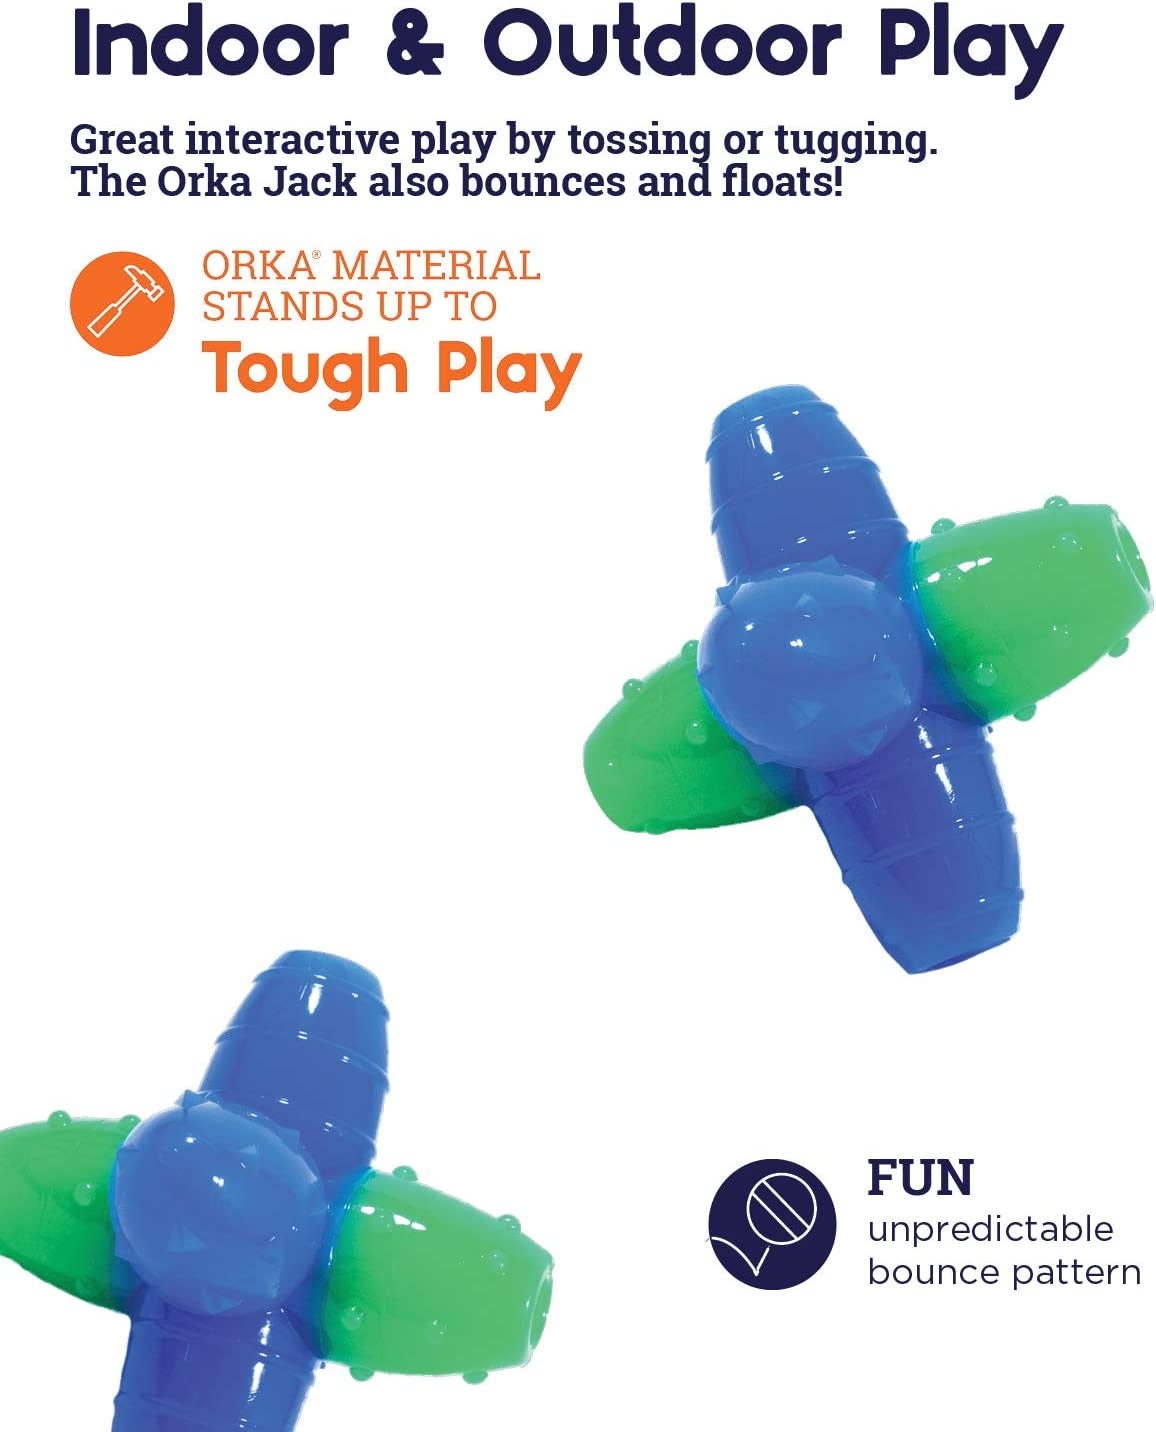 Pet Supplies : Pet Chew Toys : Dental Teeth Cleaning Chew Toys for Dogs, Dog Chew Toy for Petstages, Royal Blue, One-Size (239) :